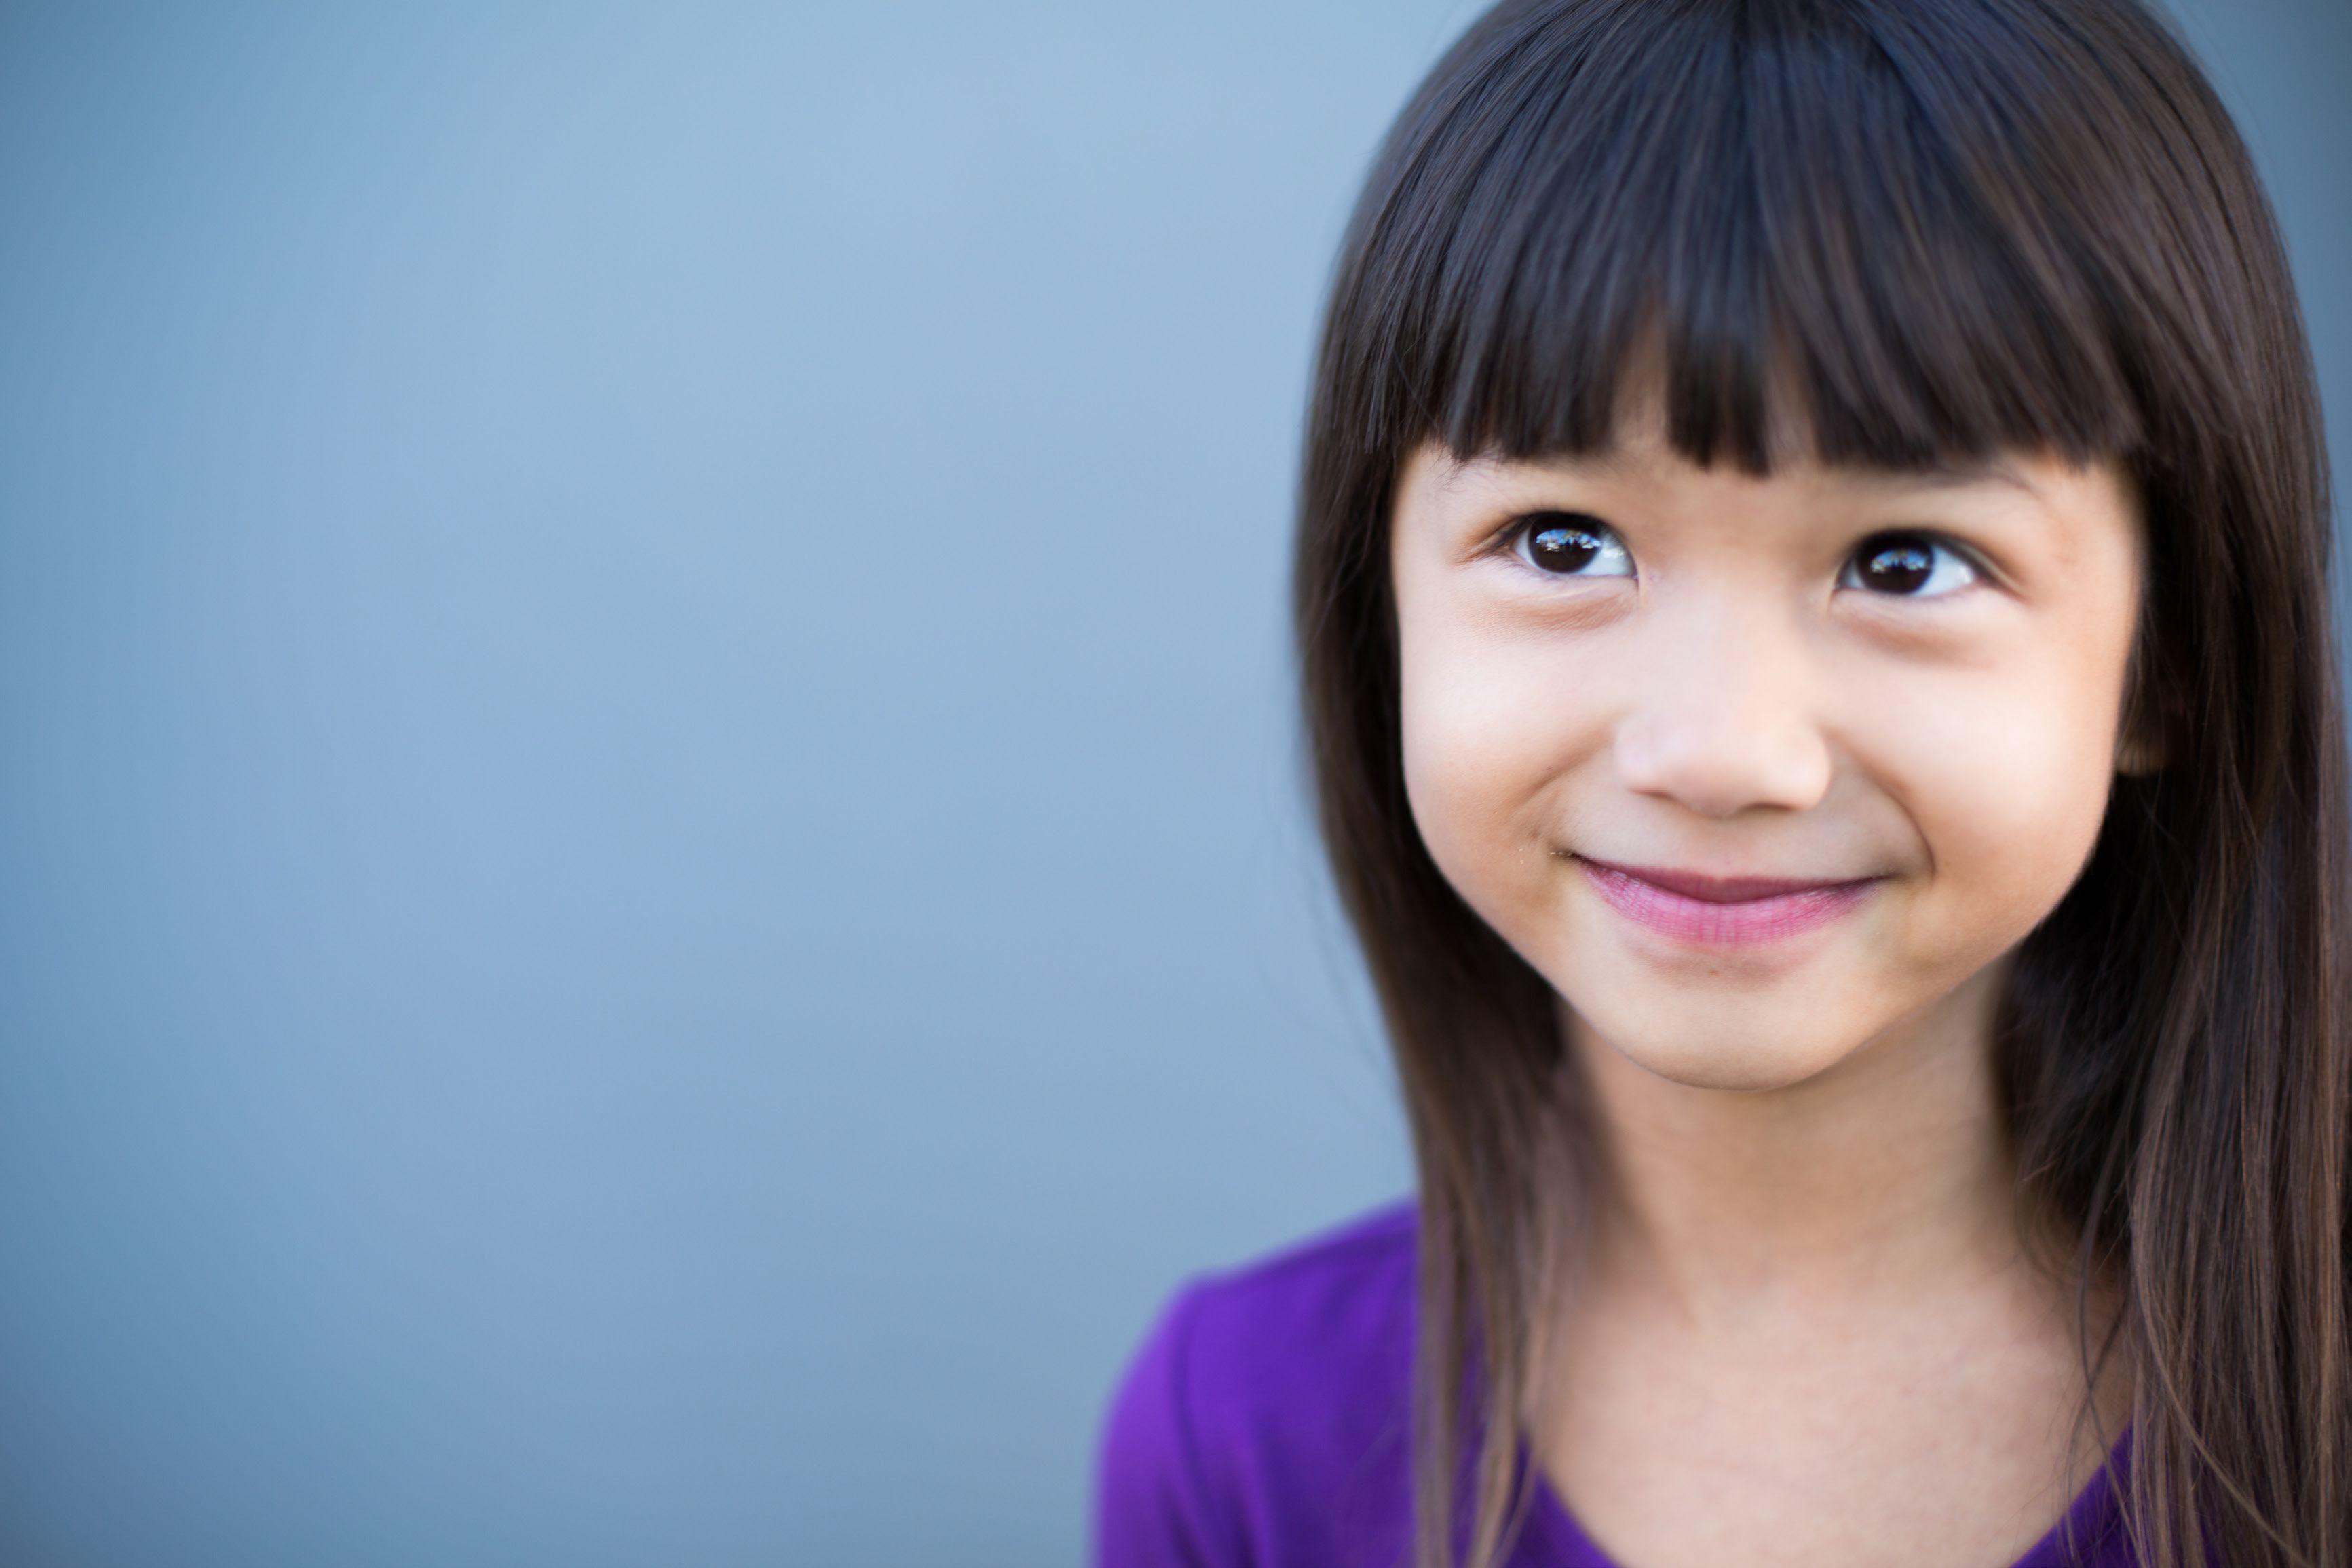 Young girl in purple shirt